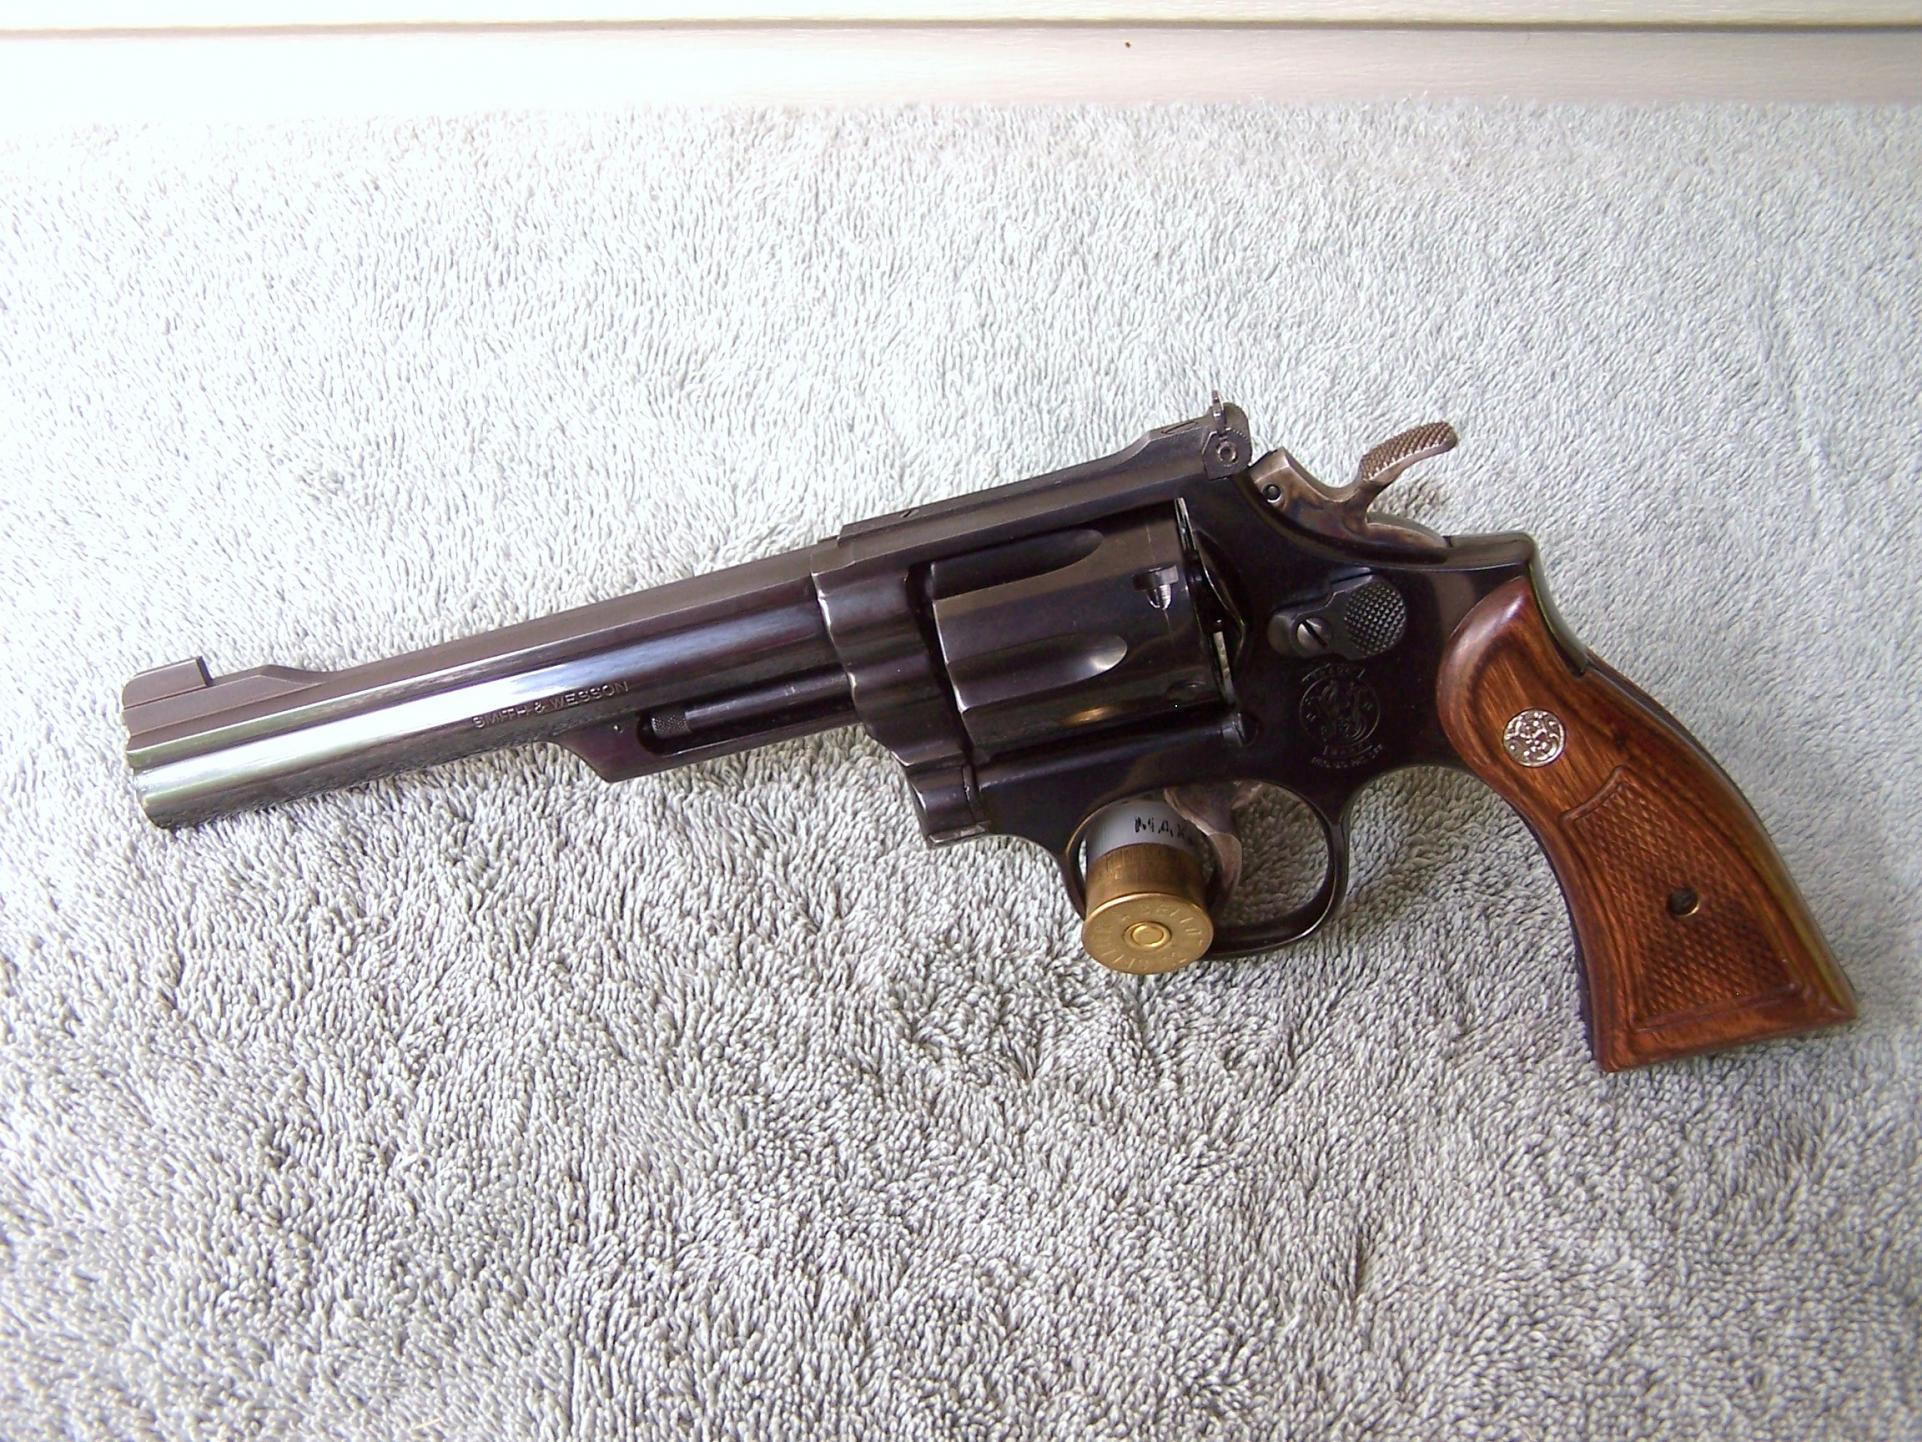 Ruger VS S&W Revolvers-acf0064.jpg